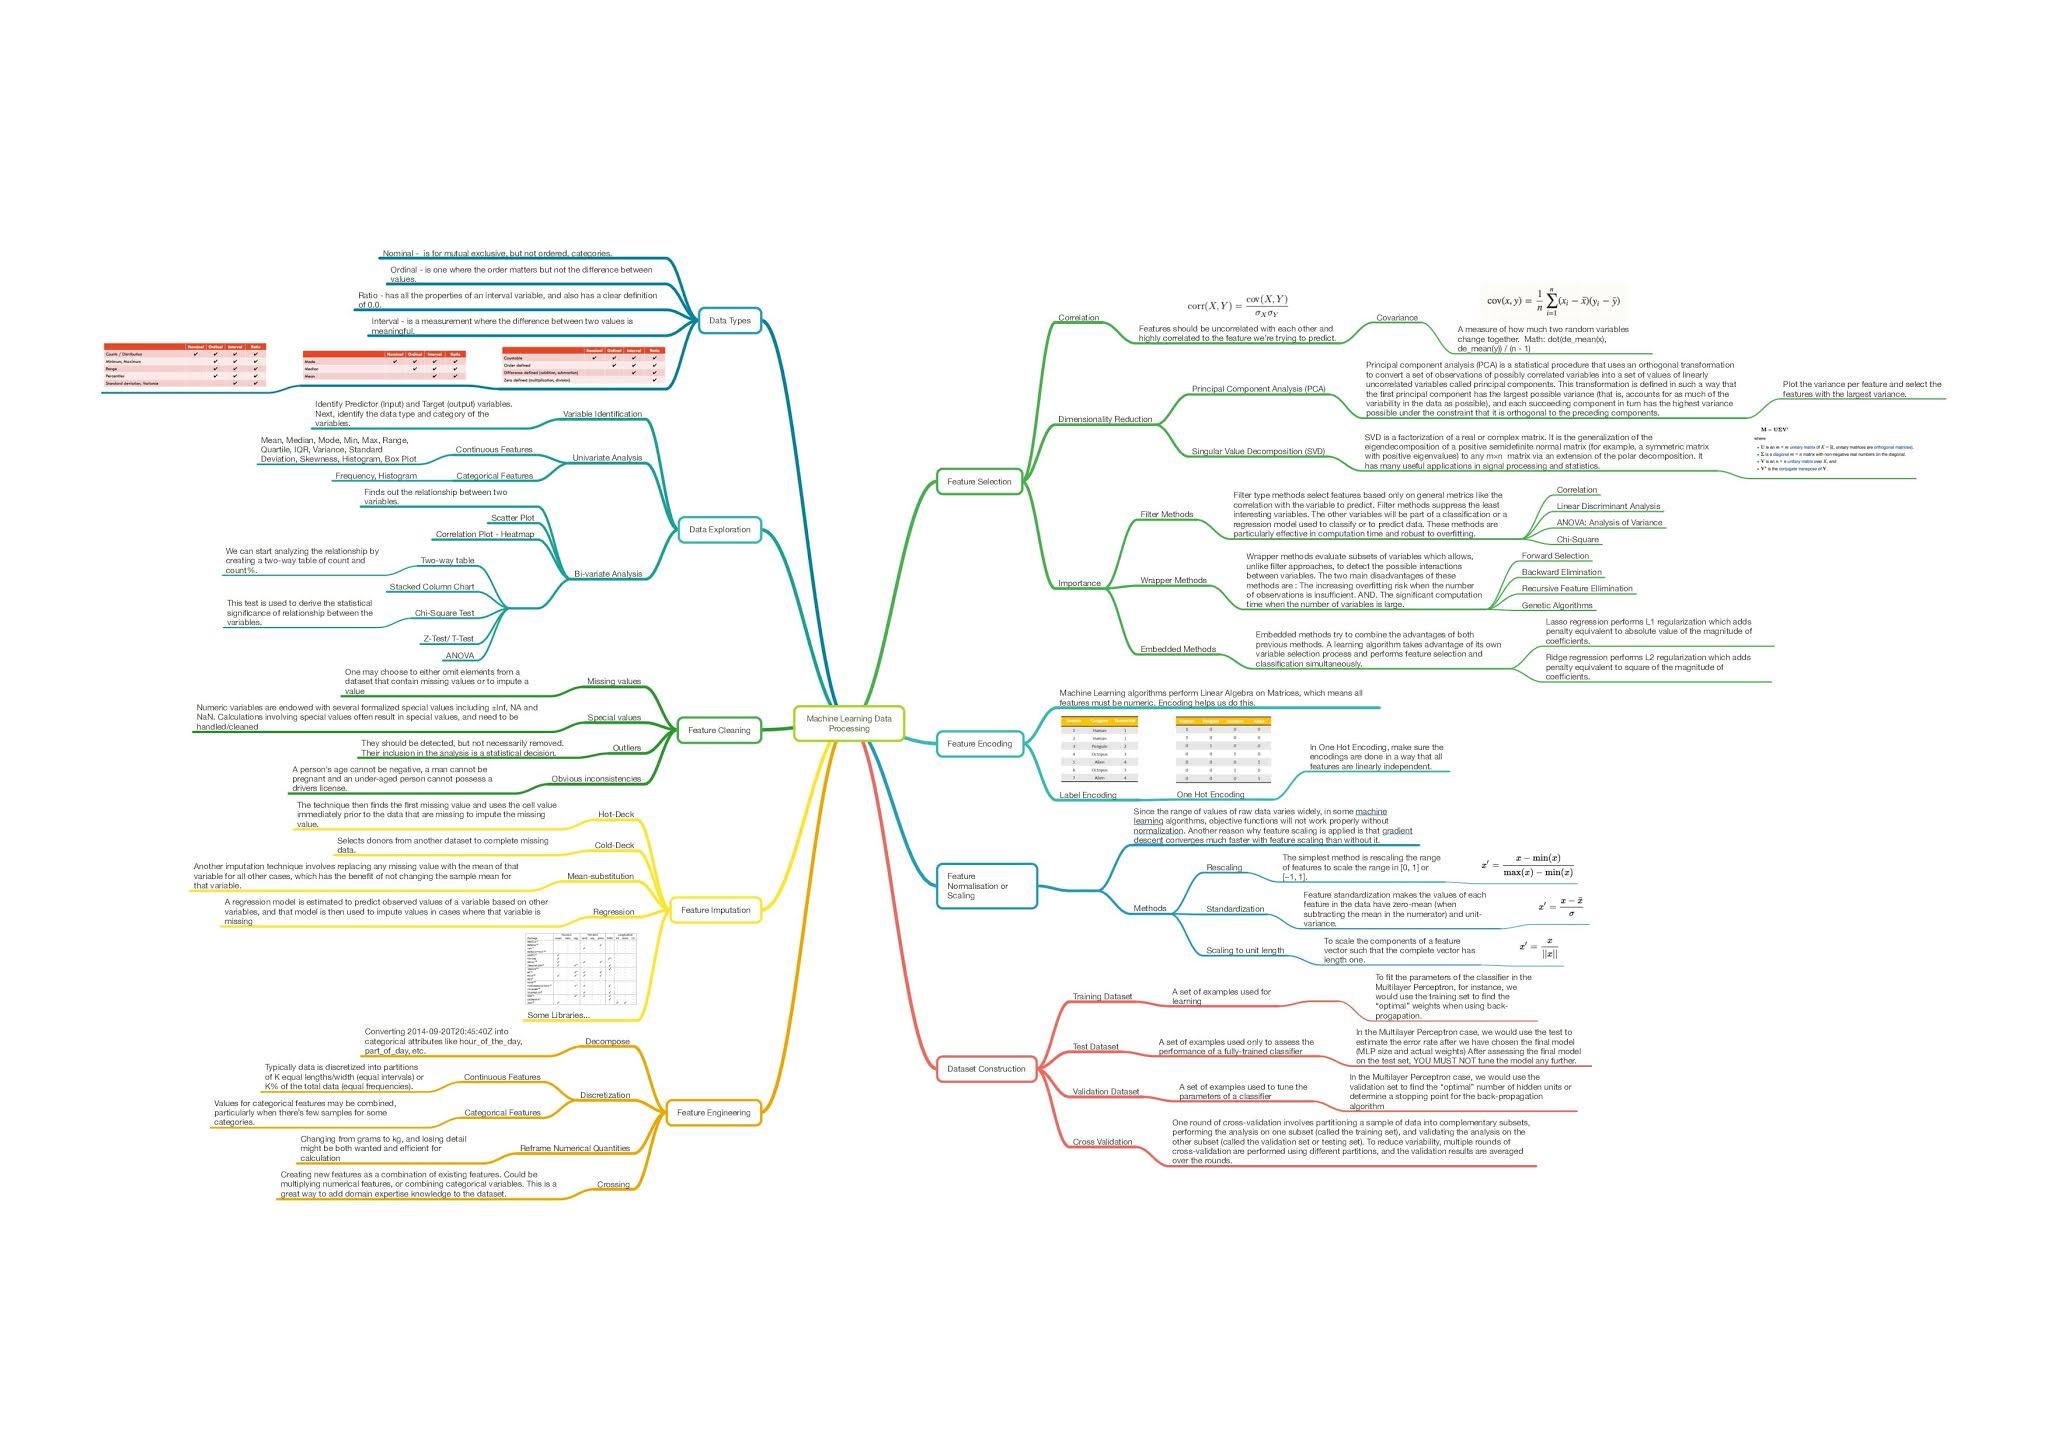 Data Processing in Machine Learning - Machine Learning Roadmap PDF